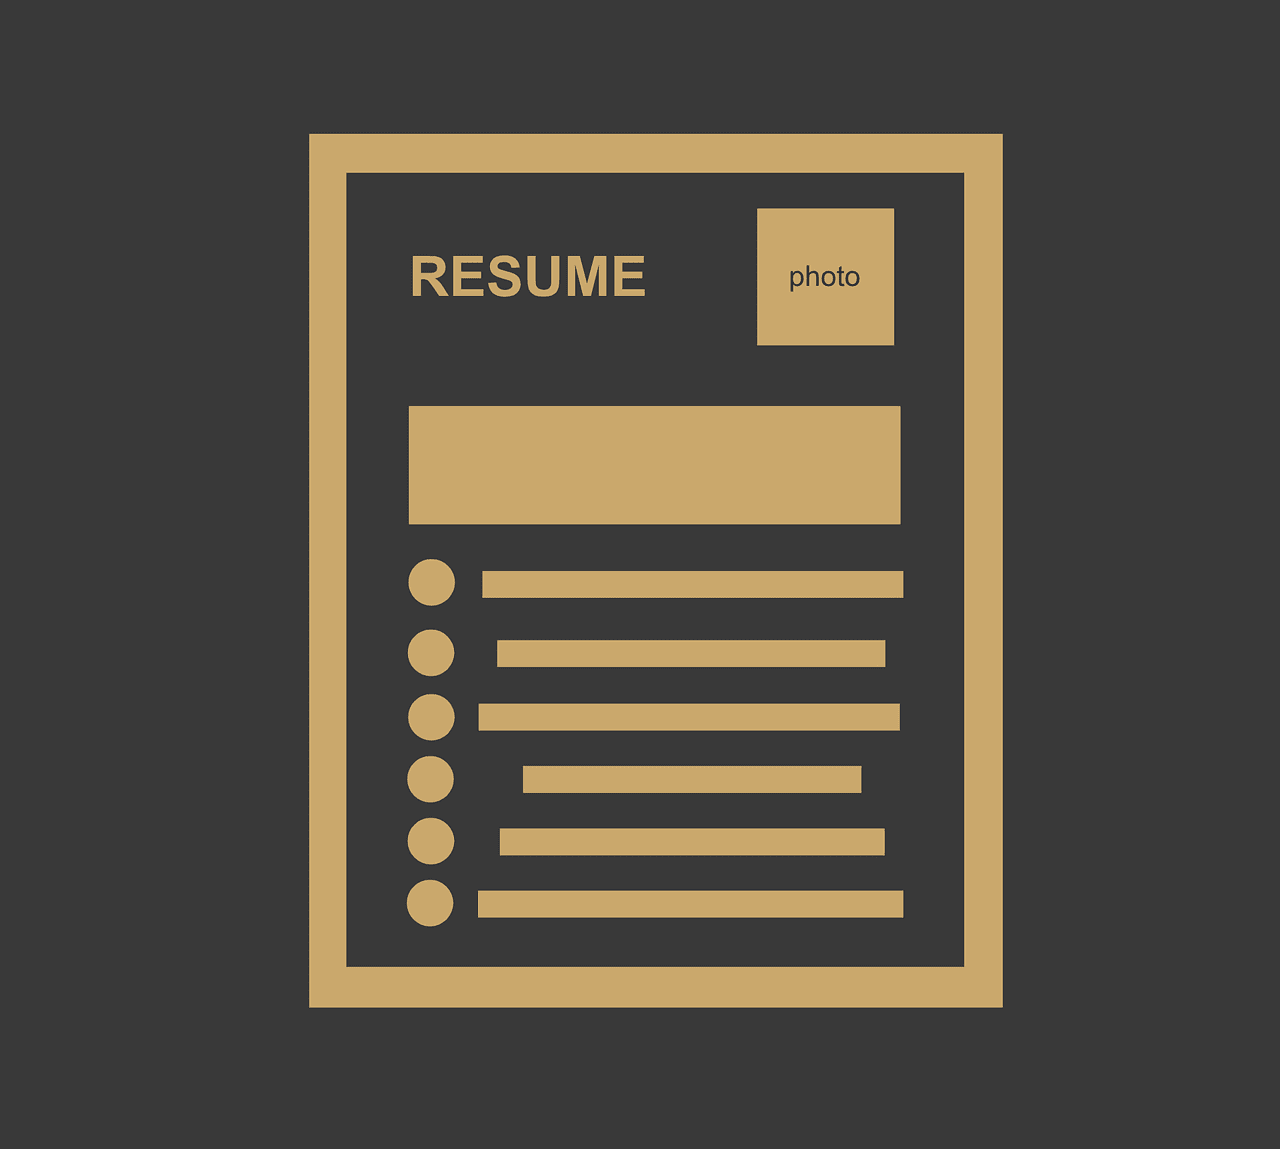 5 Essentials of a Job-winning Data Science Resume in 2021